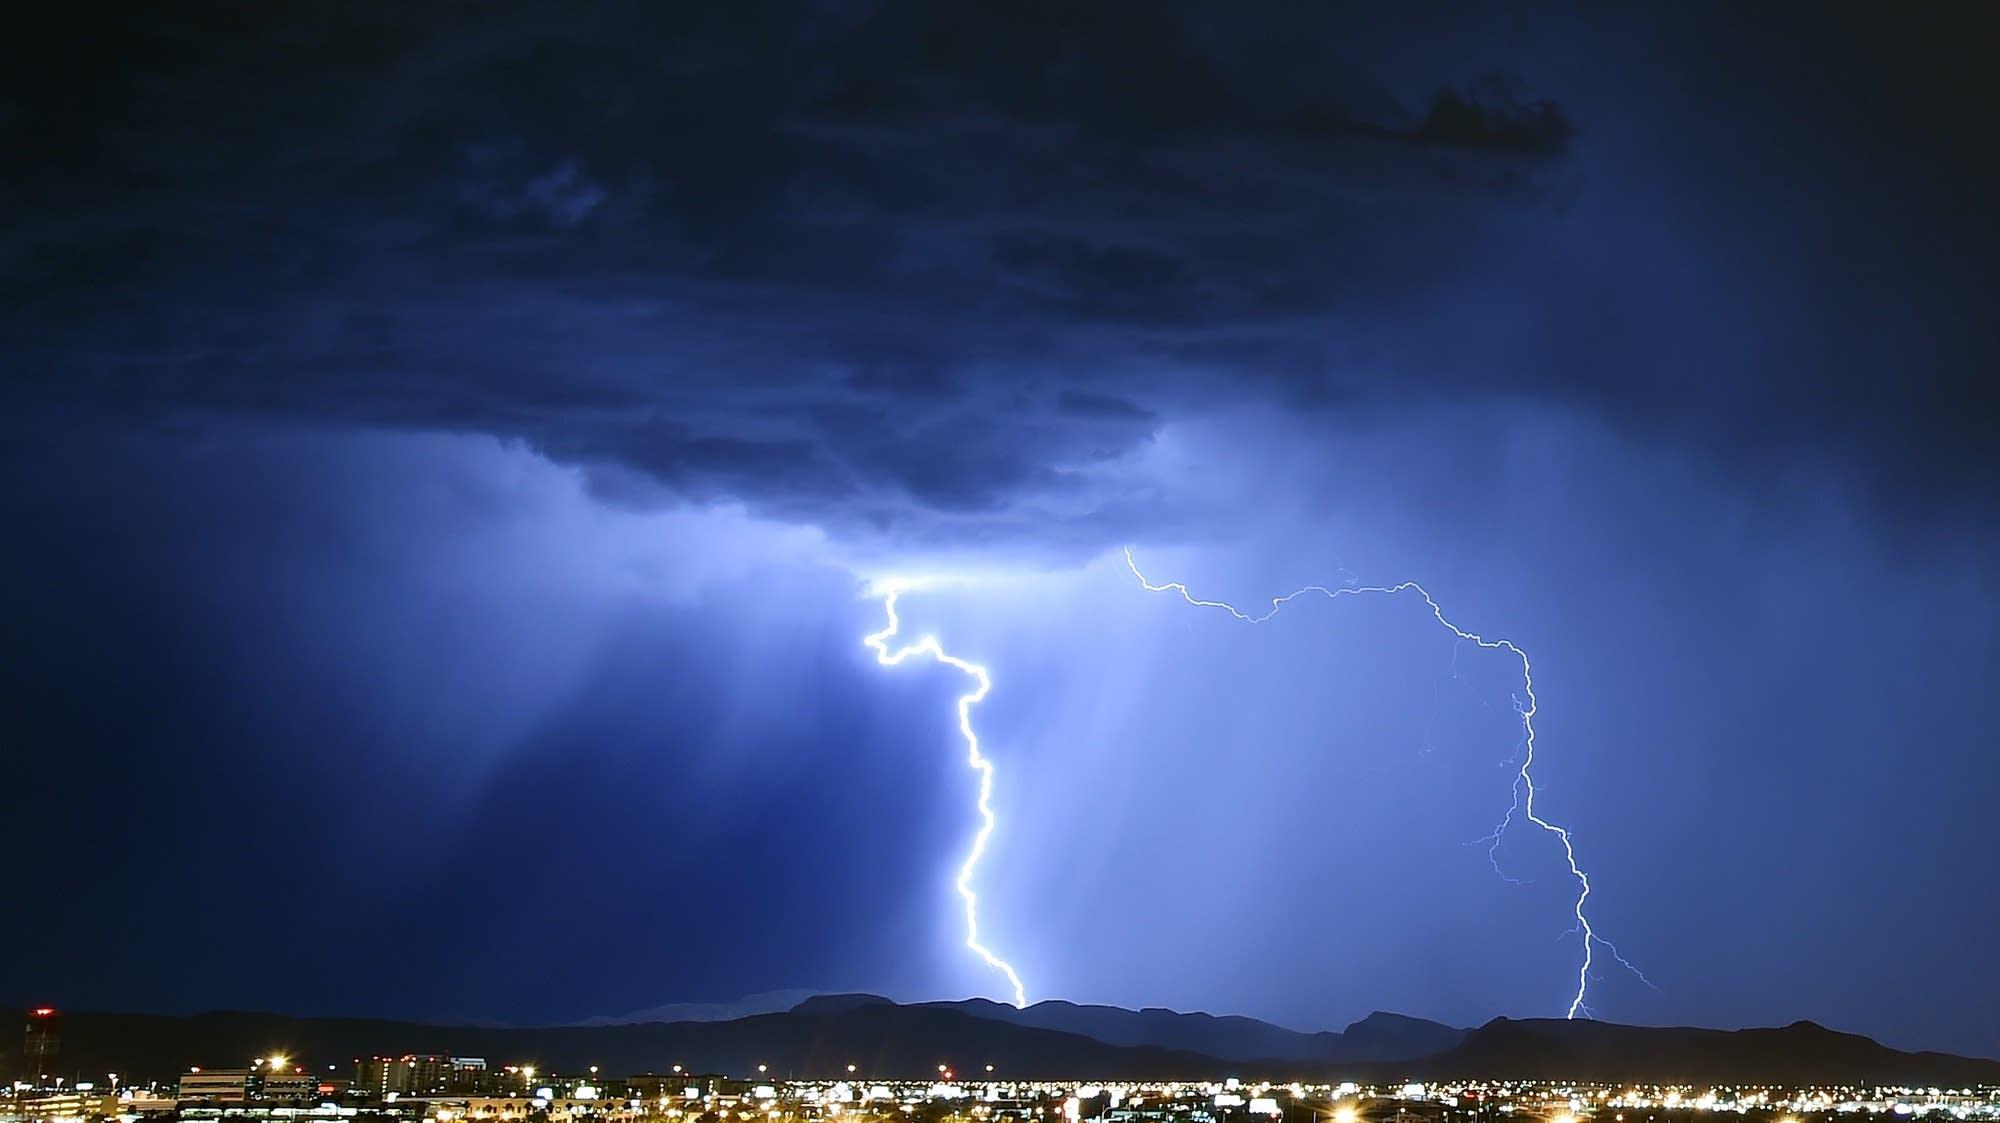 X-Men Movieverse Appreciation   Tiger Coming Out Tornado Lightning